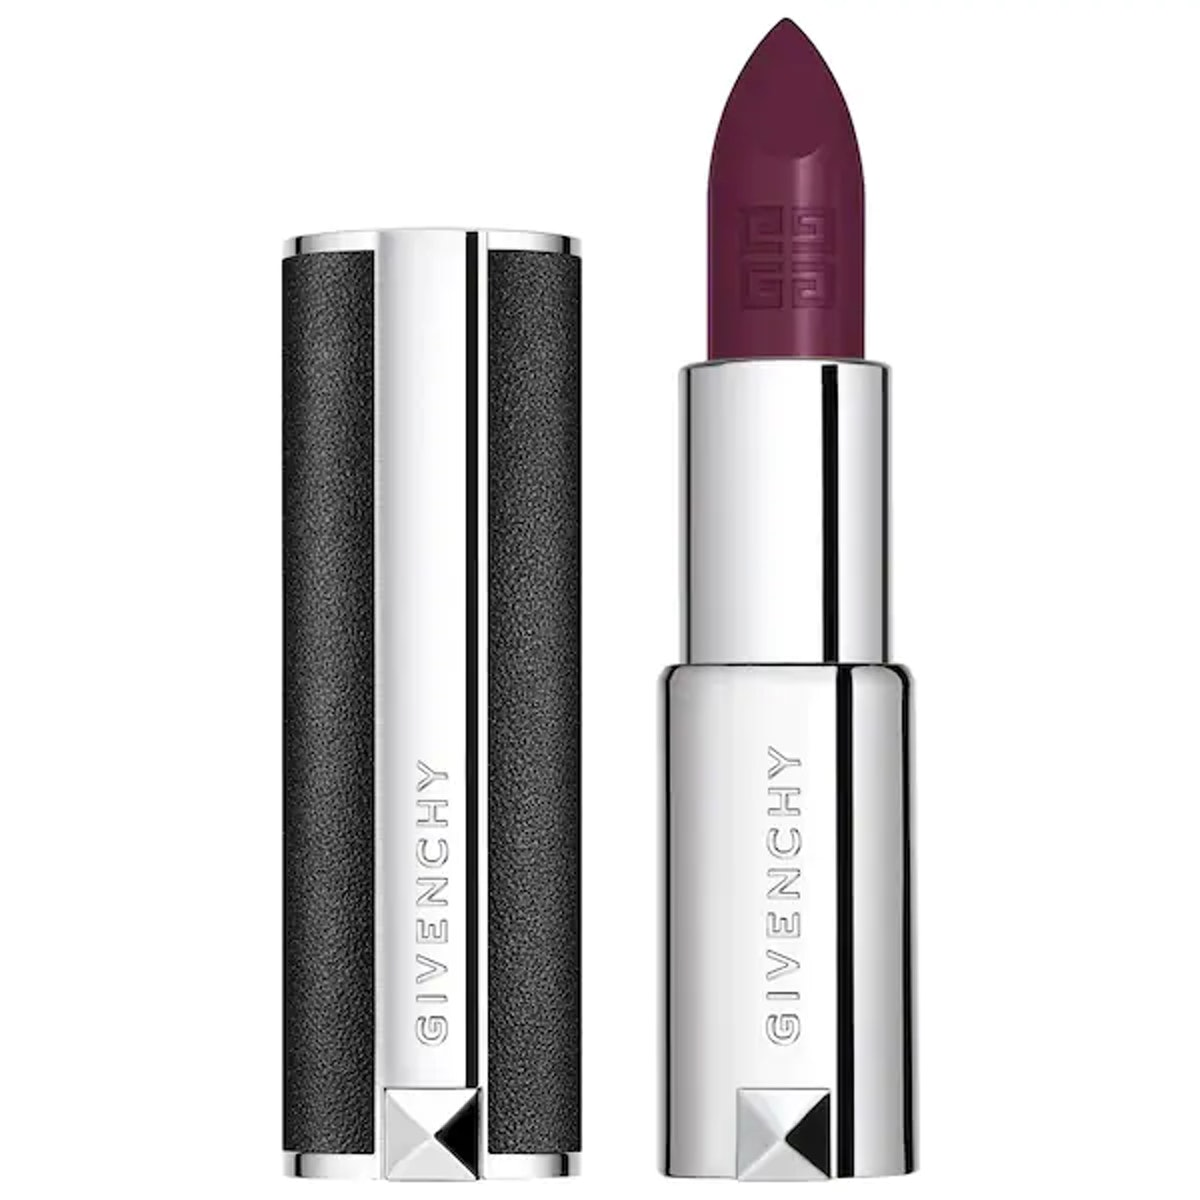 Le Rouge Lipstick in Violet Audacieux